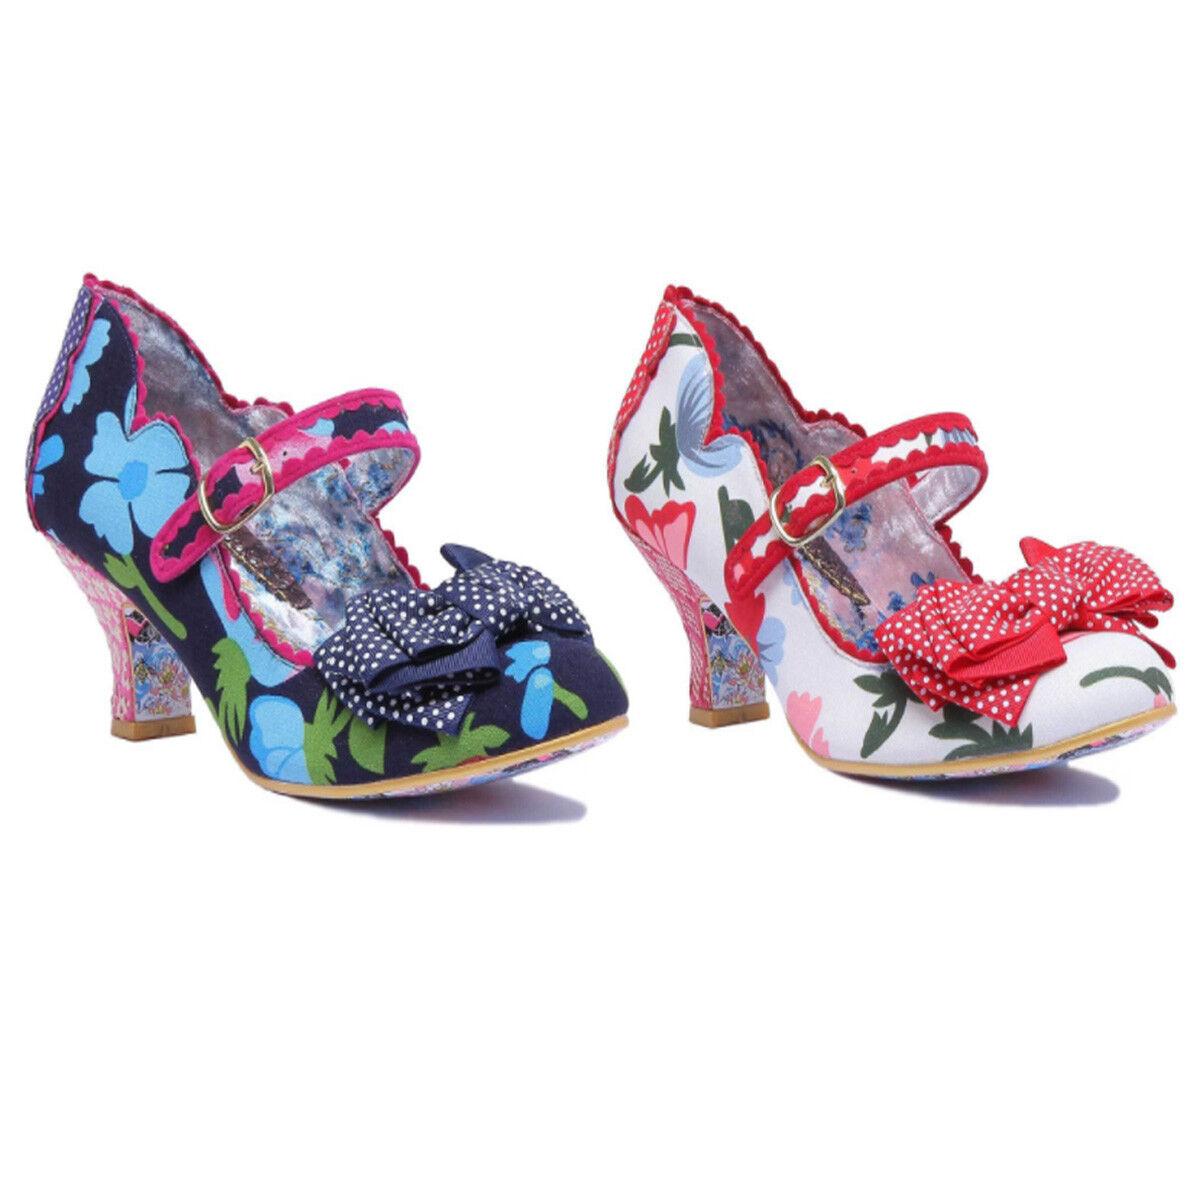 Irregular Choice Balmy Nights Damens Mary Jane Buckle High Heel with Bow Größe UK